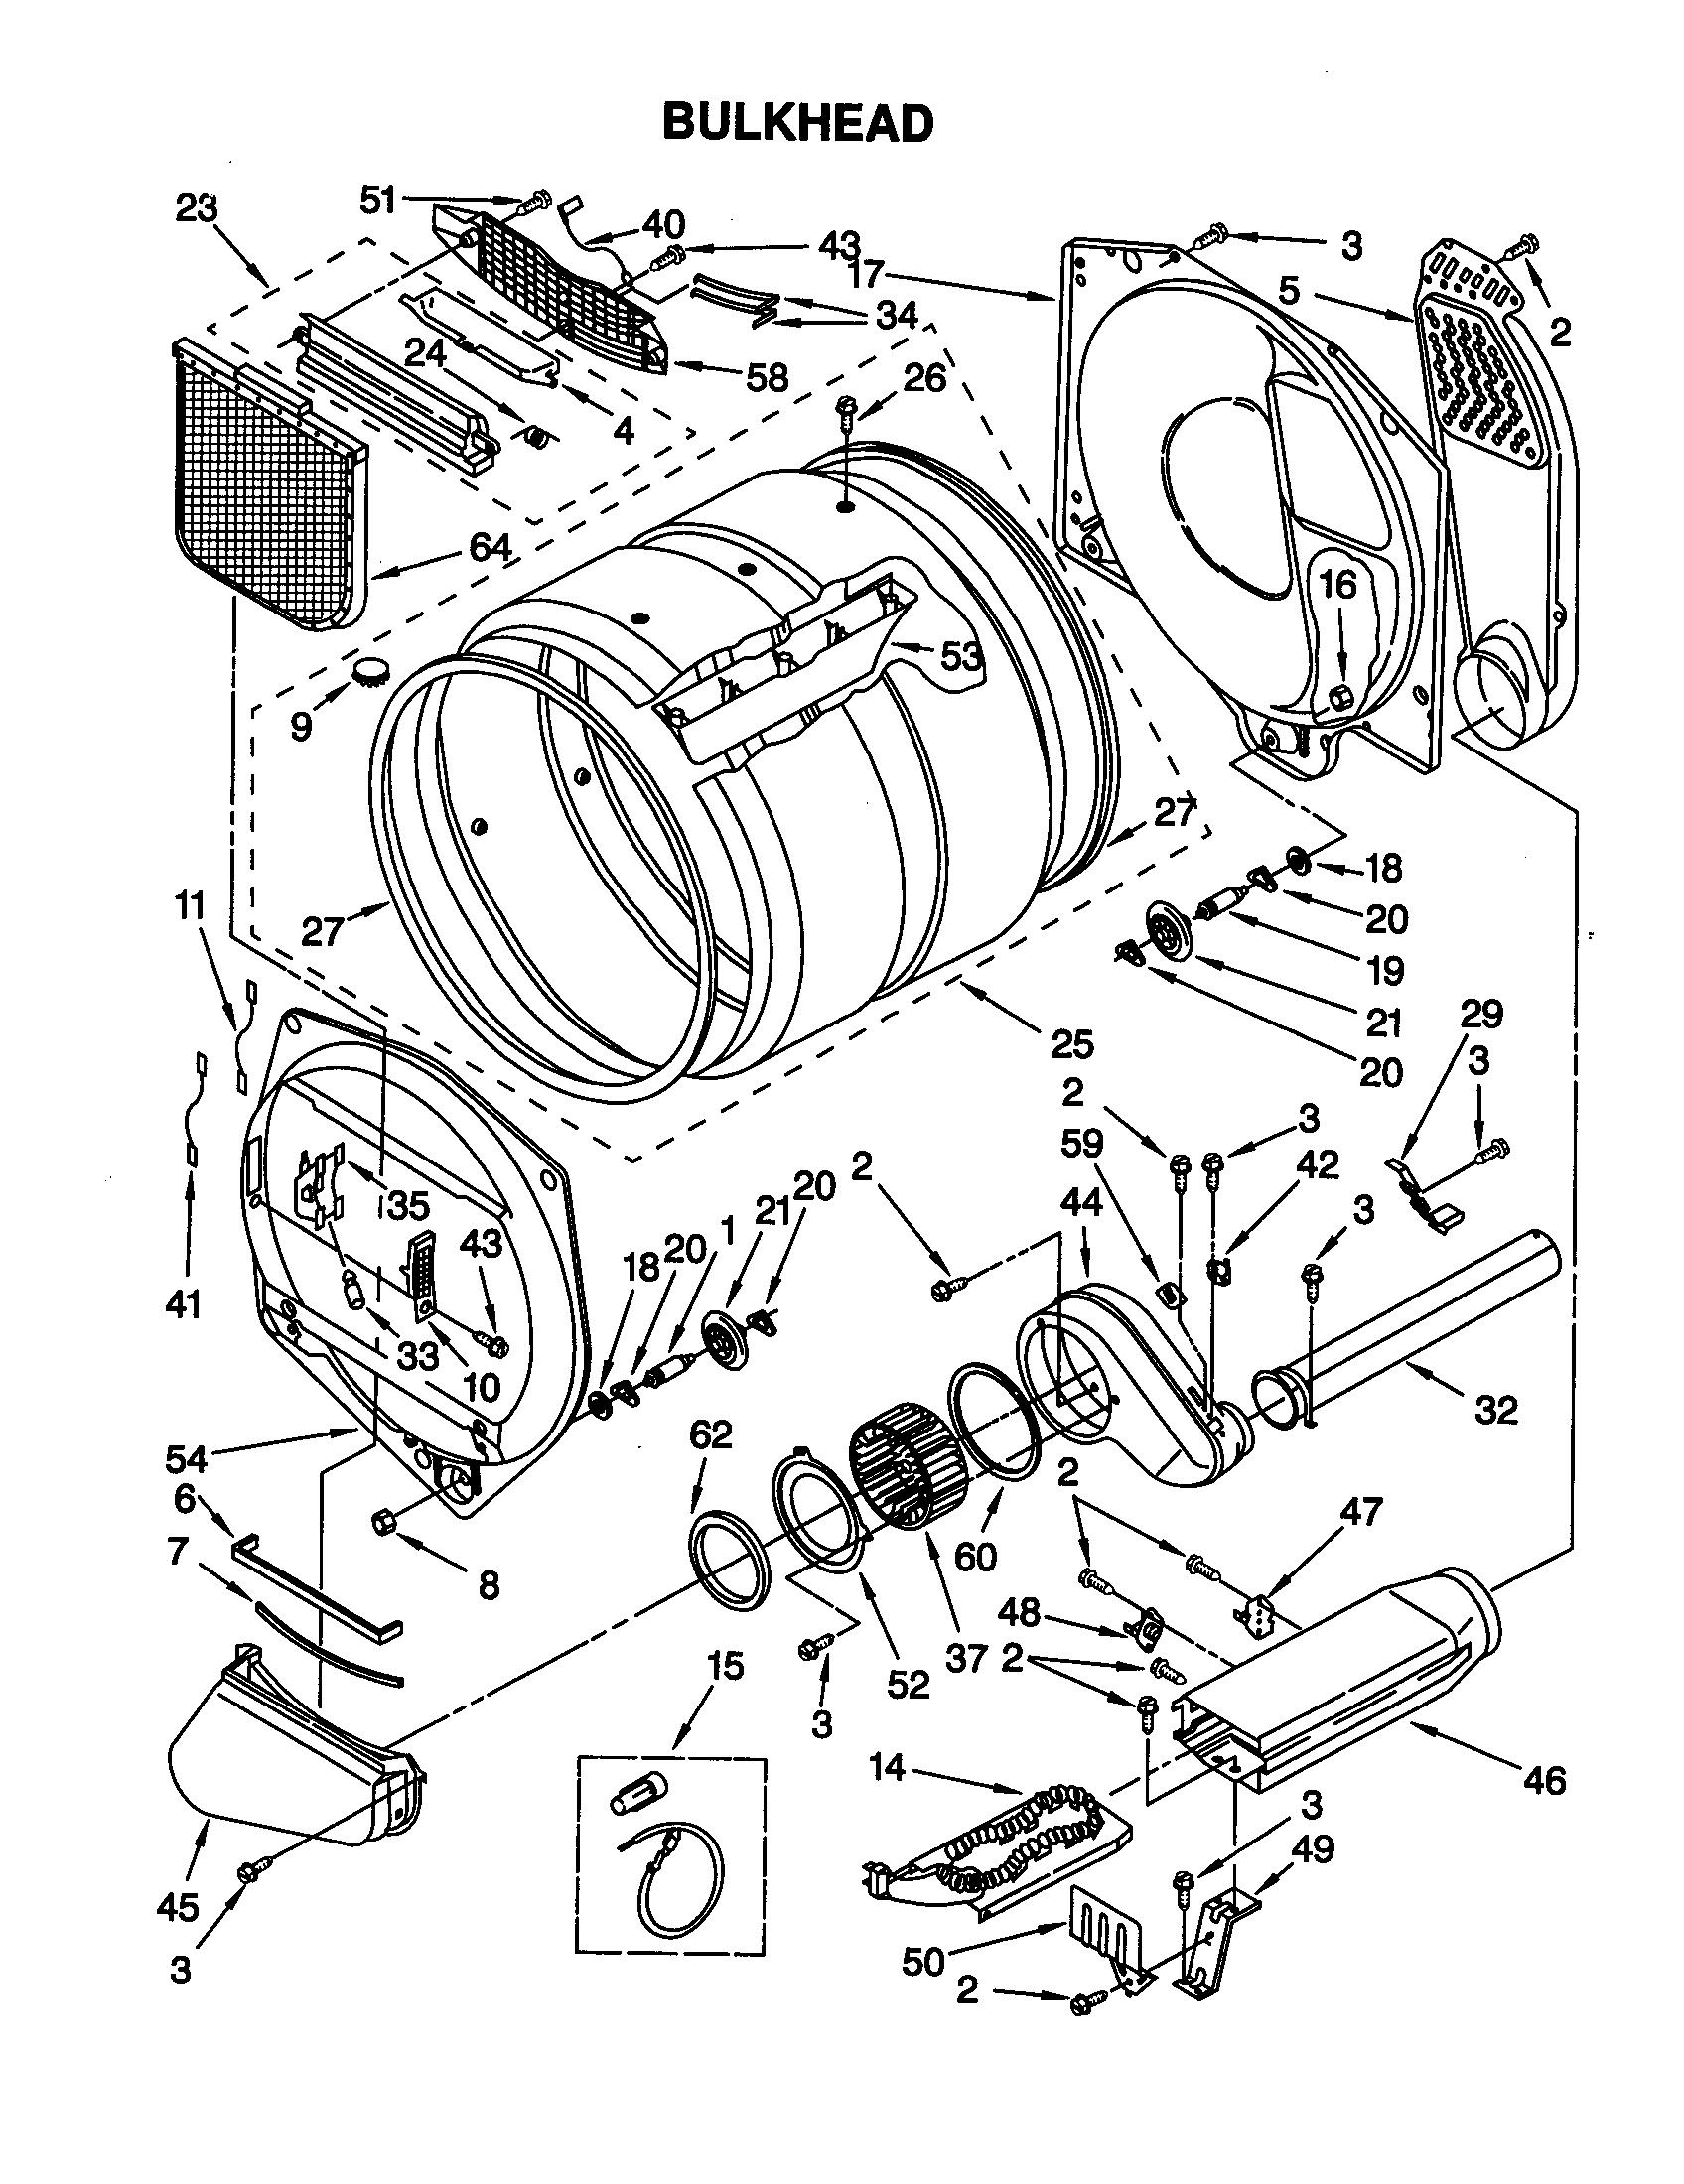 BULKHEAD Diagram & Parts List for Model 11069912990